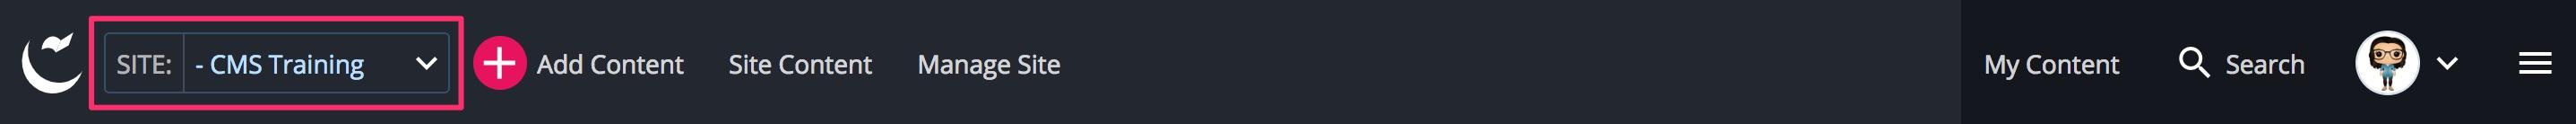 Site dropdown menu from the main toolbar